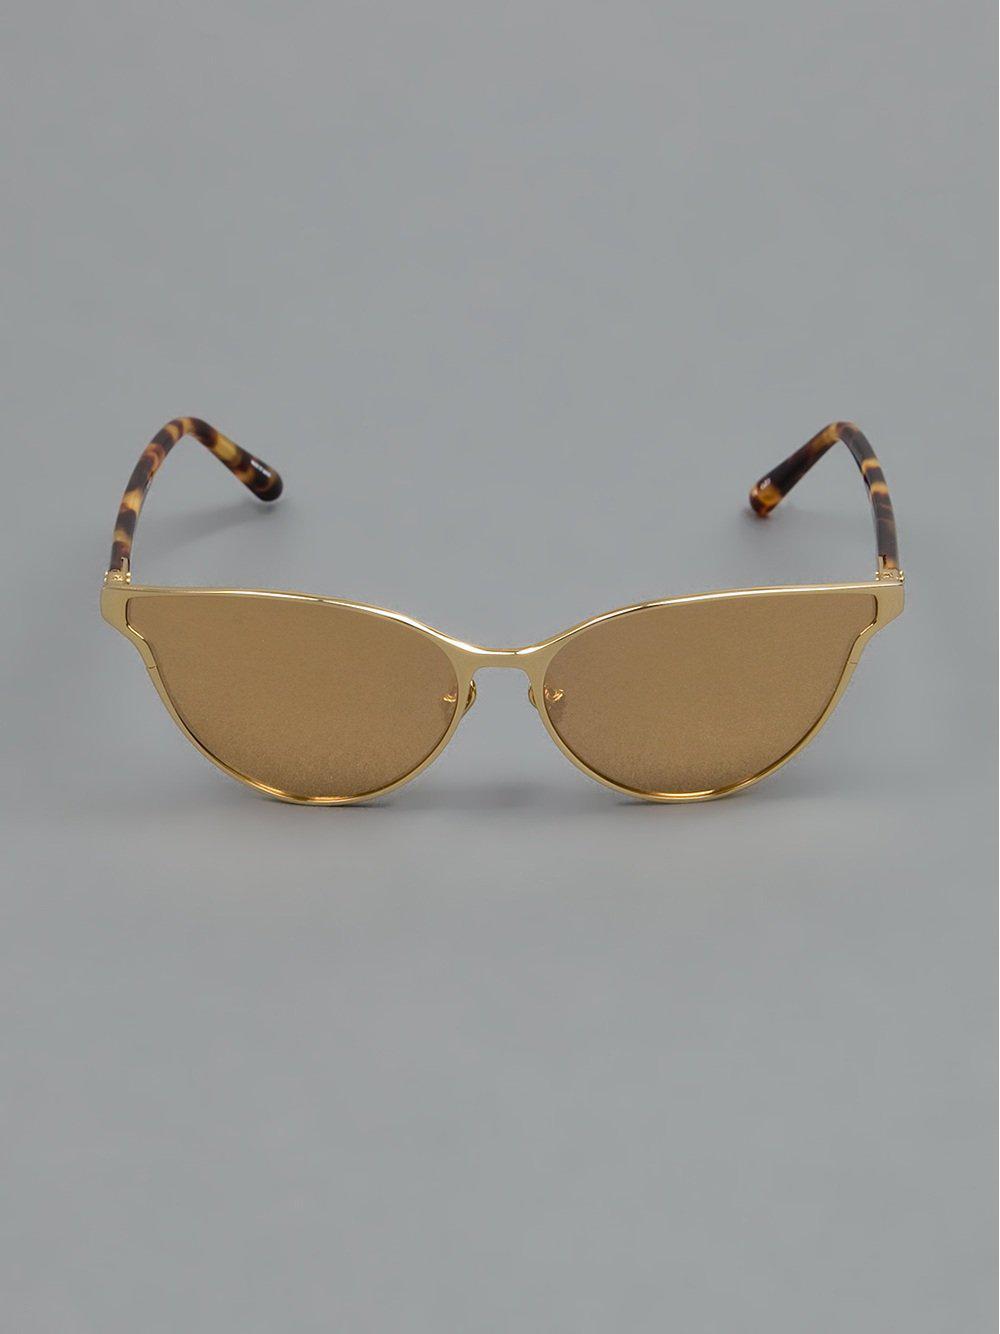 27c4c9c5878 Linda Farrow Contrast Leopard Print Sunglasses - Lyst